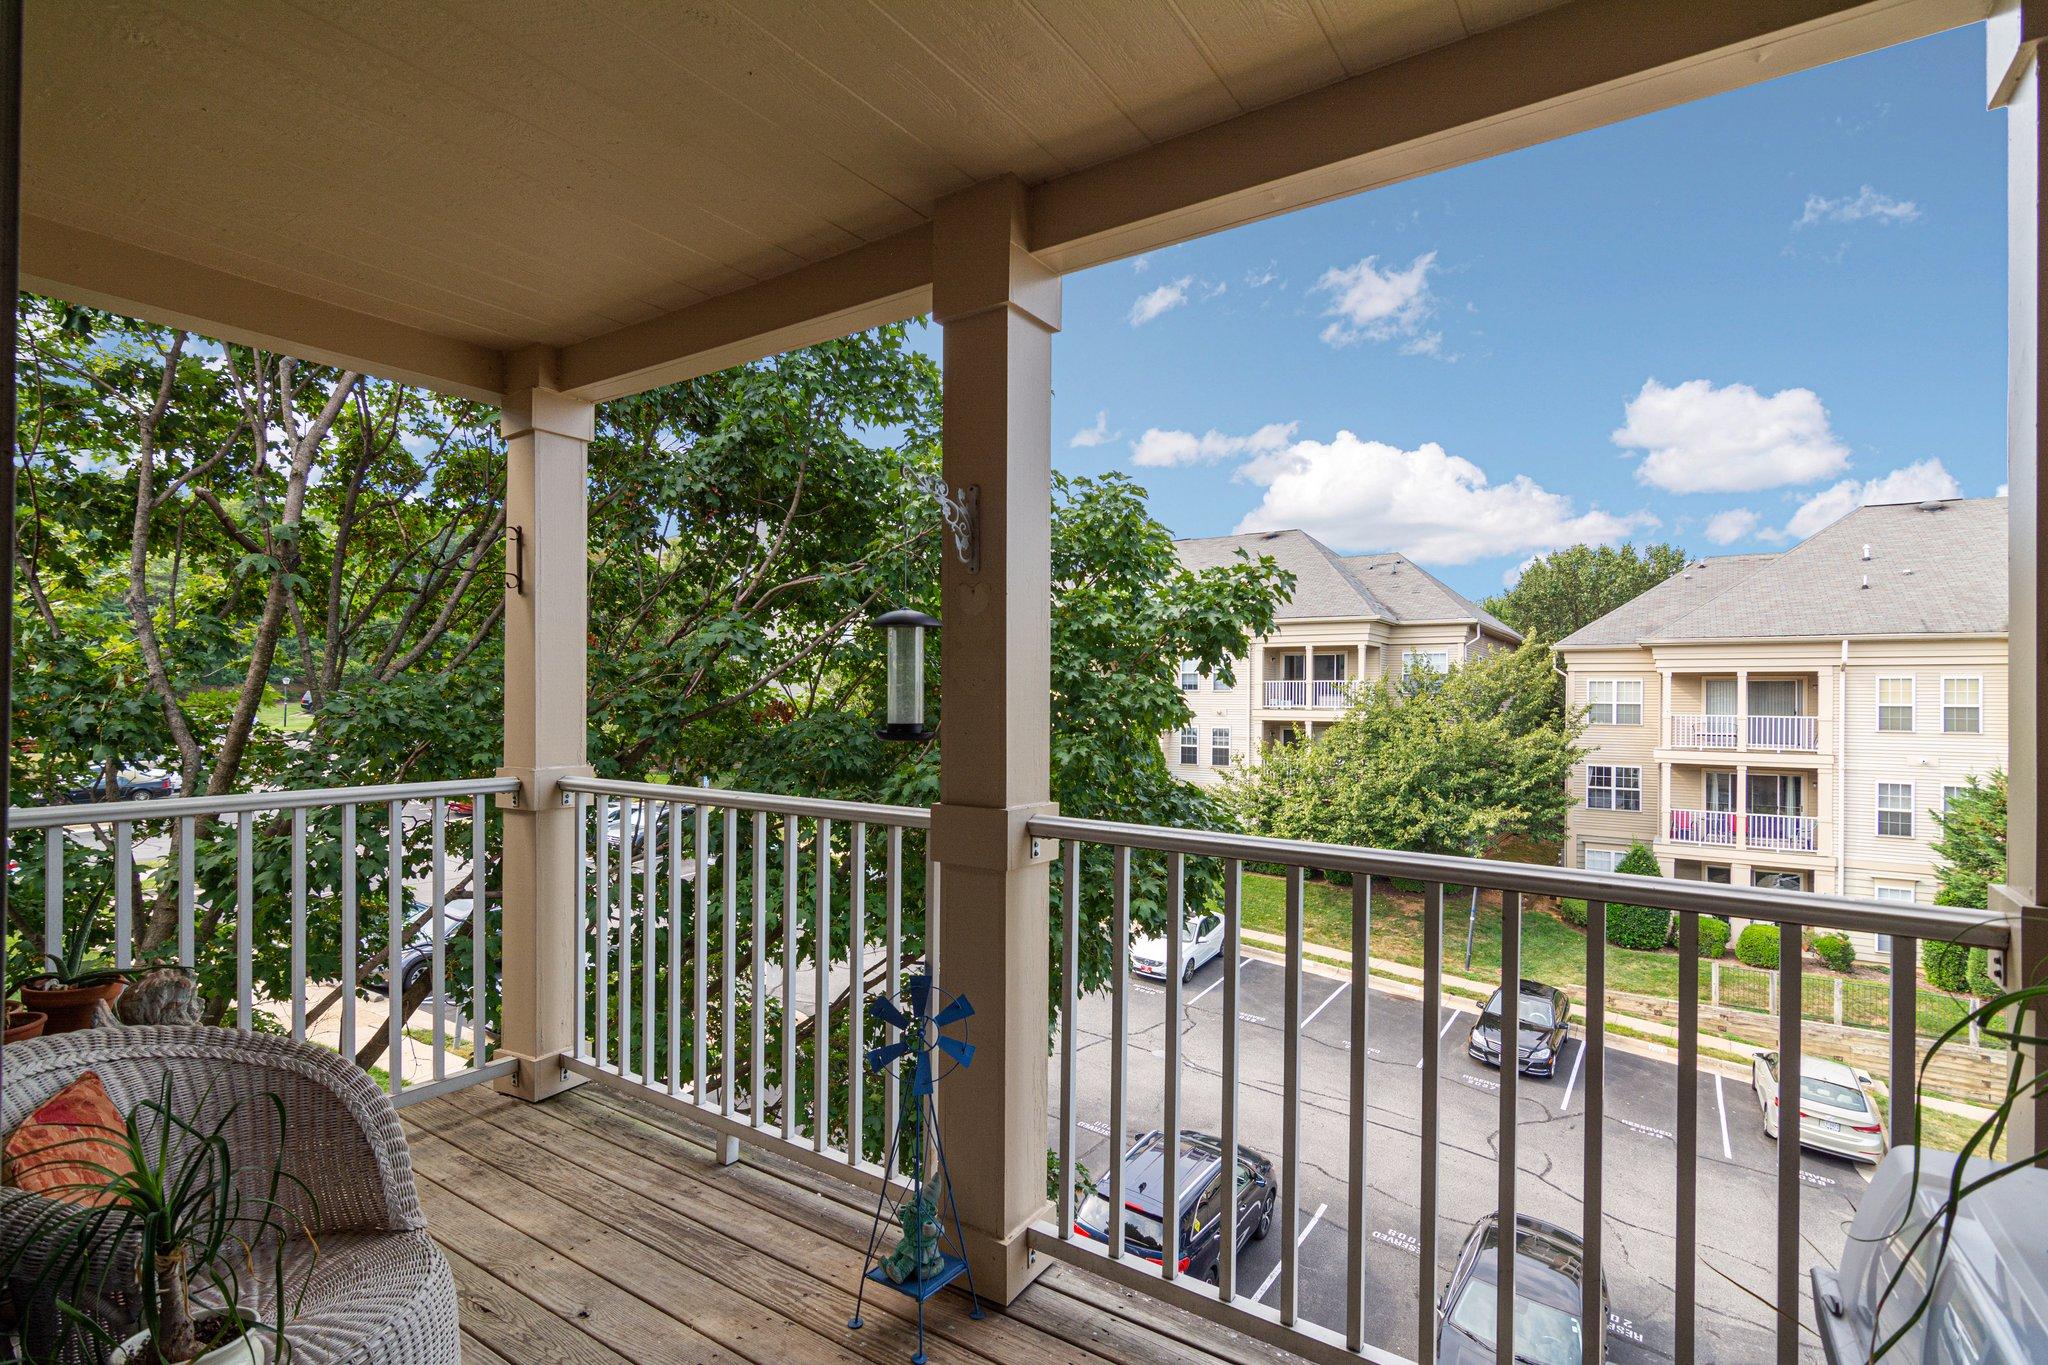 1066 Gardenview Loop, Woodbridge, VA 22191, USA Photo 3